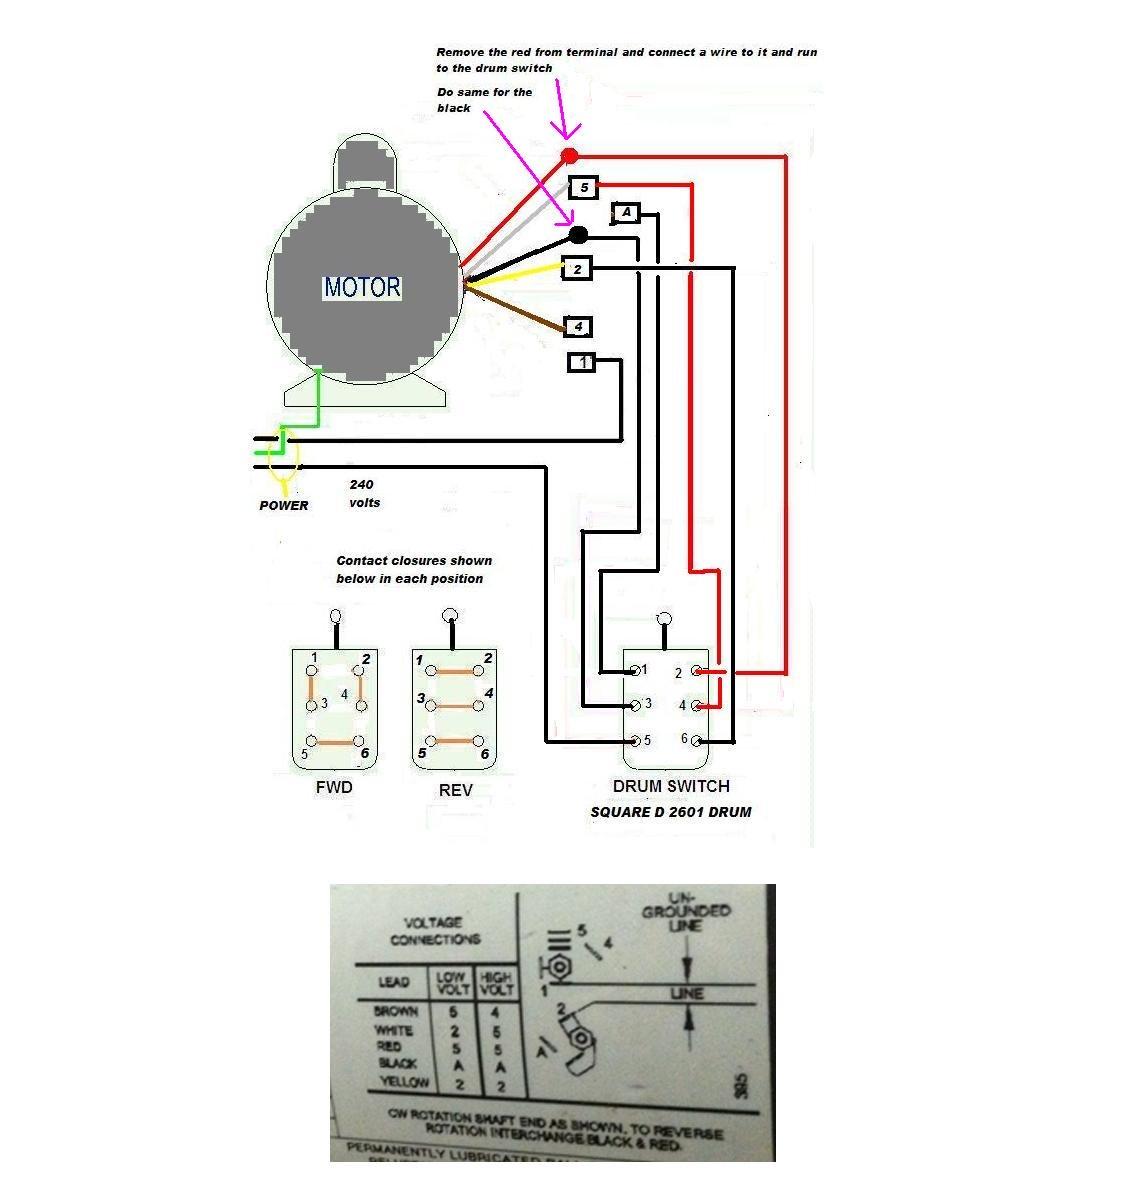 DIAGRAM] Square D Drum Switch Wiring Diagram FULL Version HD Quality Wiring  Diagram - MEDIAGRAME.BANDAKADABRA.ITDiagram Database - Bandakadabra